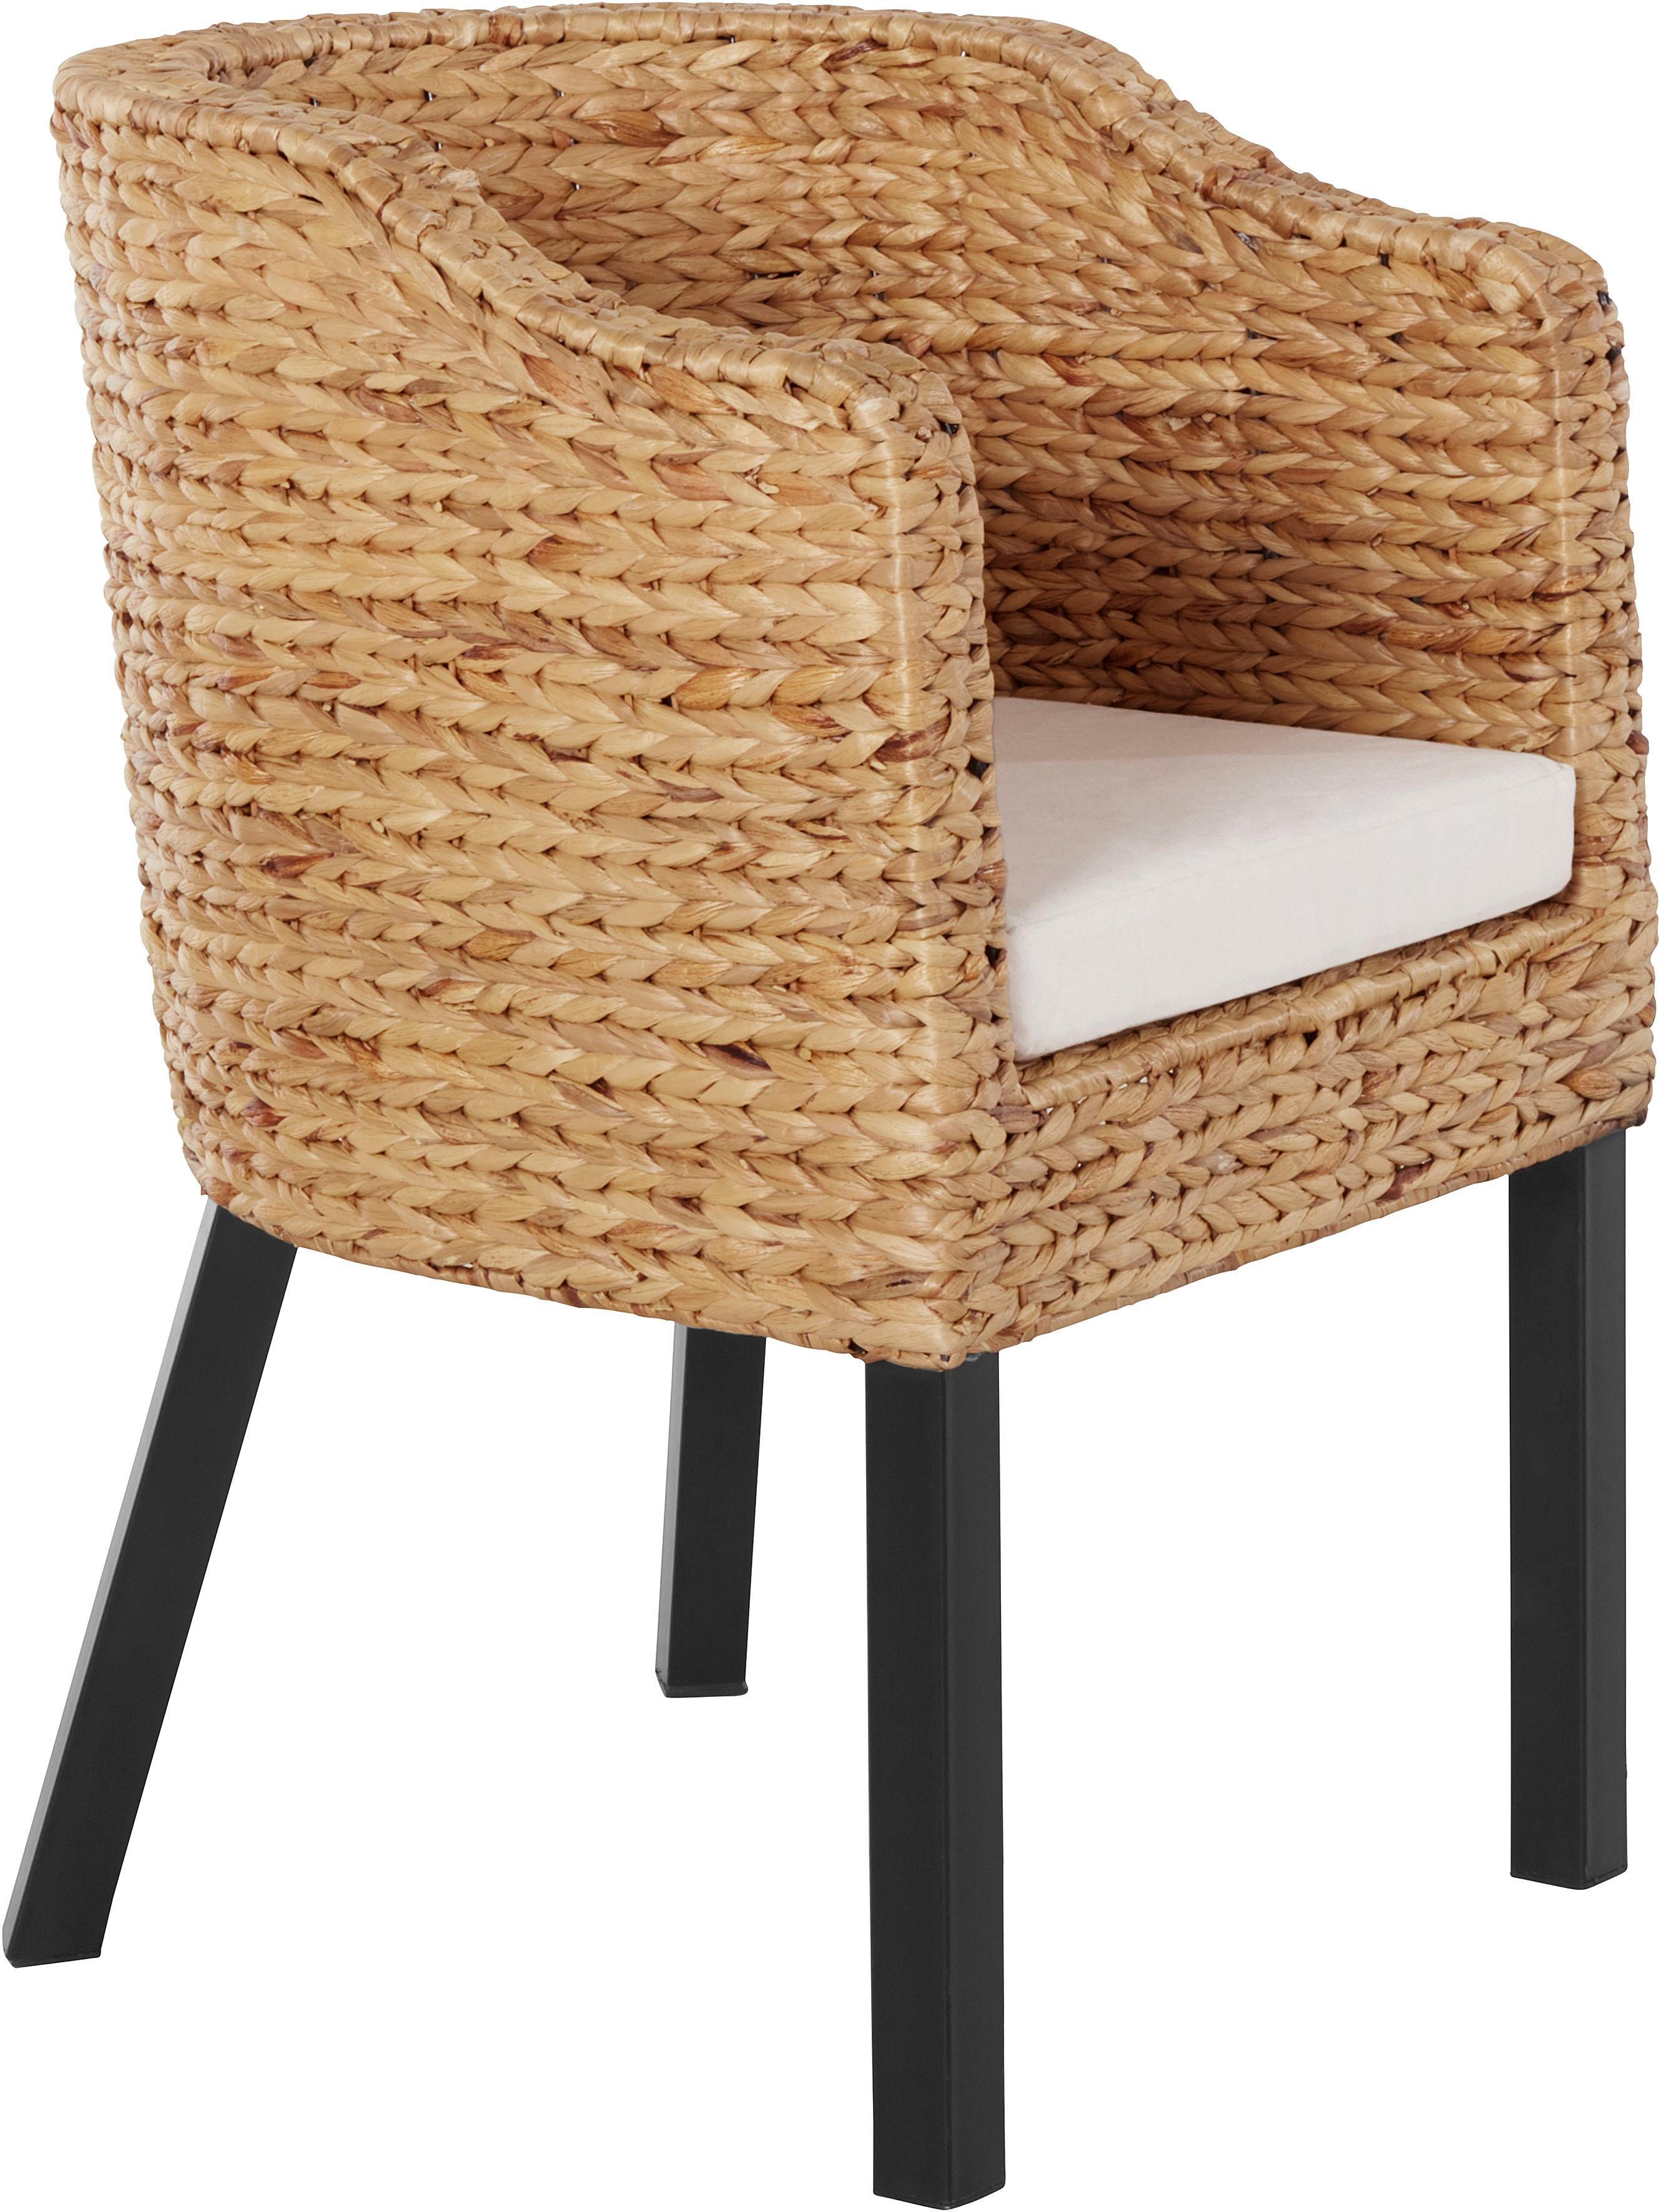 Home affaire Stuhl aus Wasserhyazinthe inkl Kissen